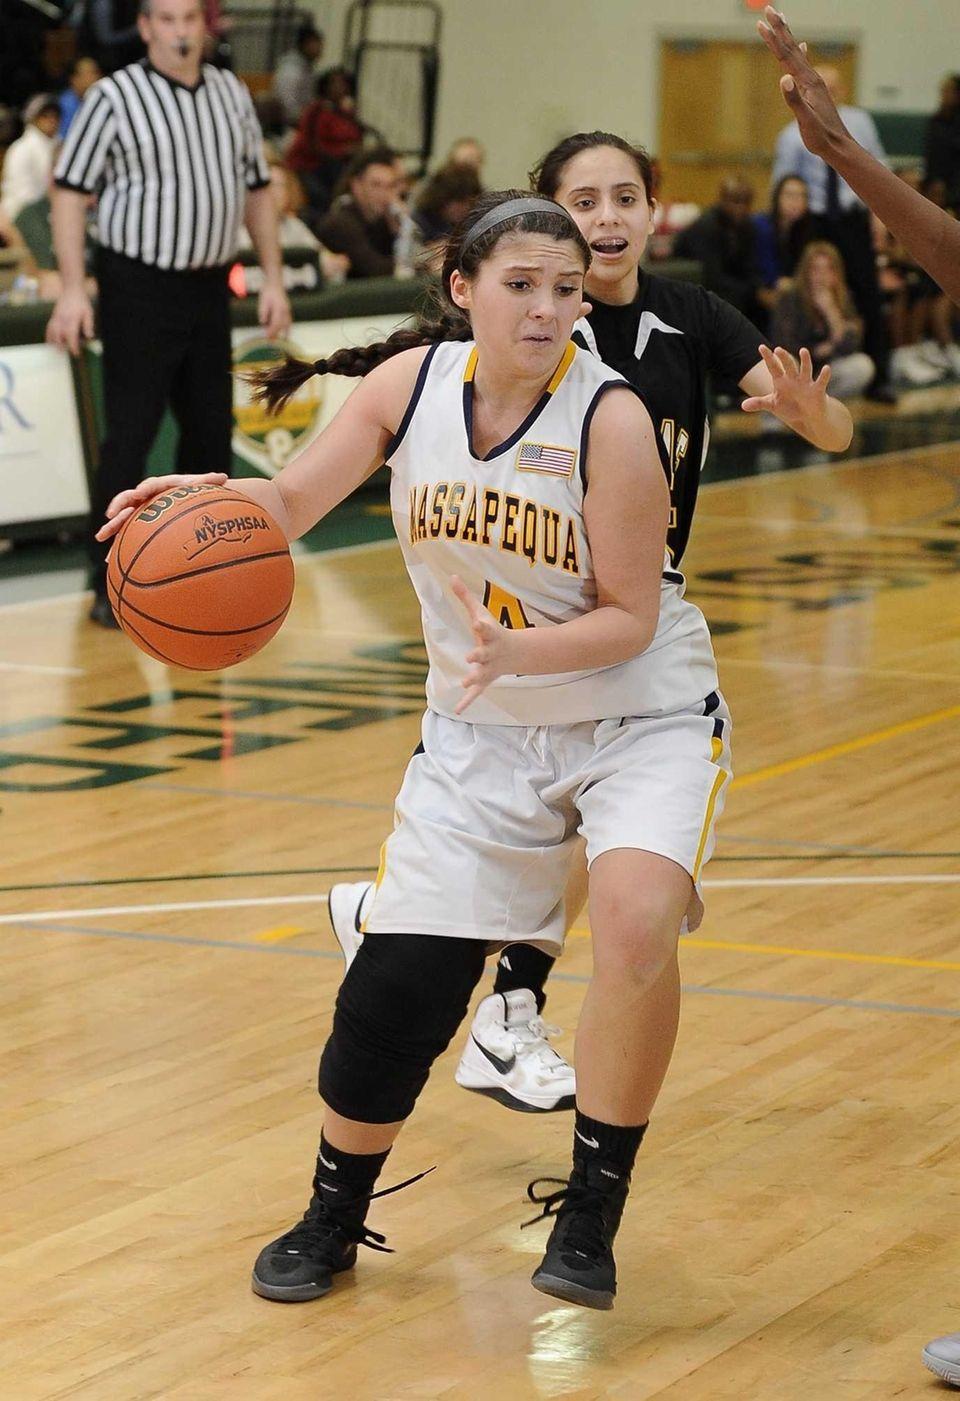 Massapequa's Sabrina Fregosi drives to the basket against